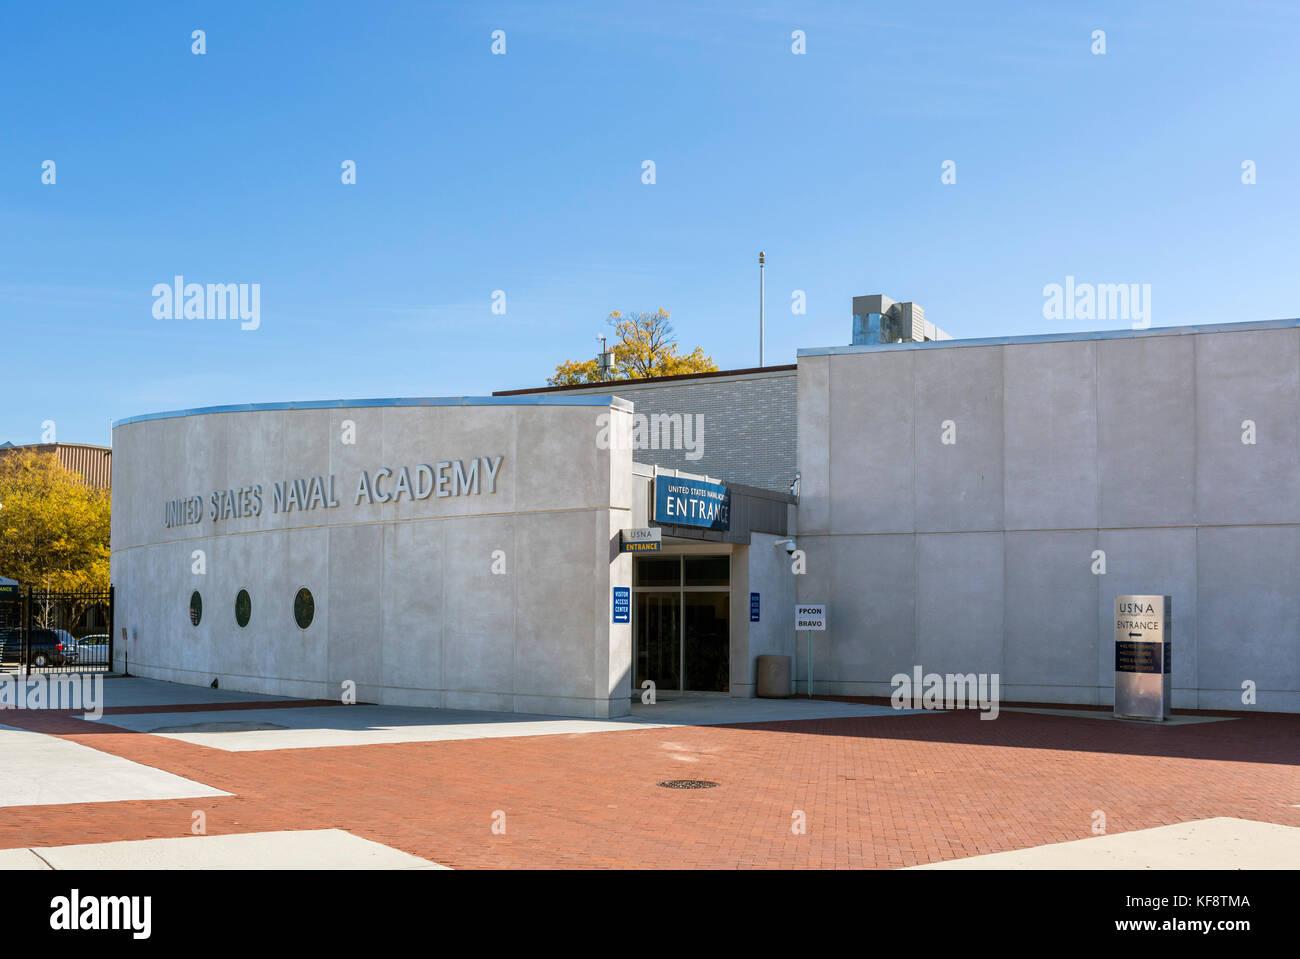 Eingang an der United States Naval Academy, Annapolis, Maryland, USA Stockbild